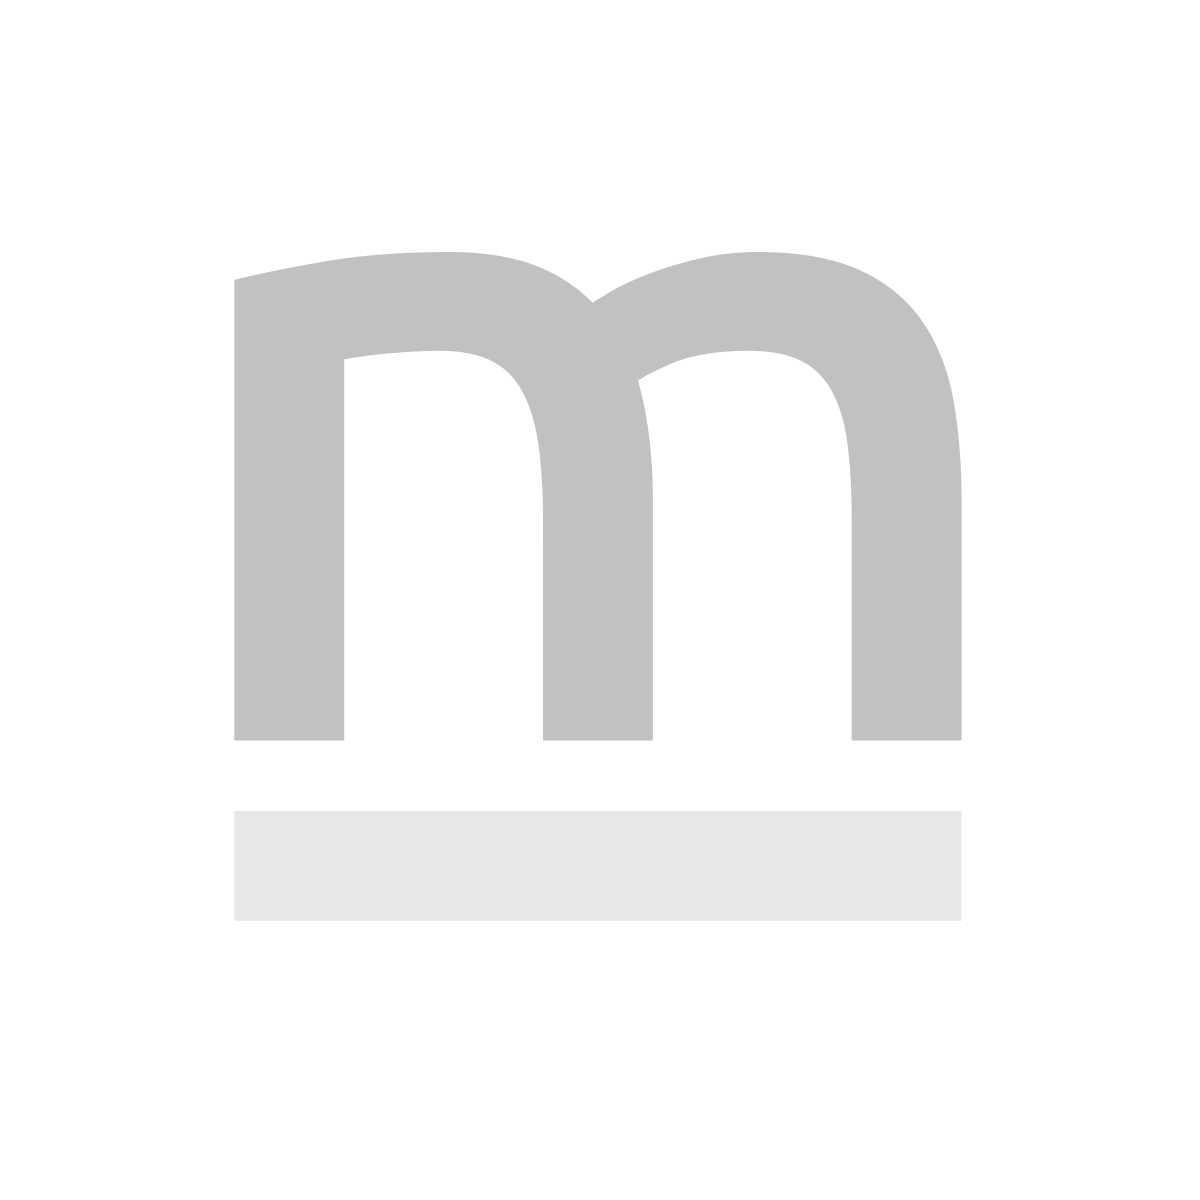 Fototapeta - Słoneczna dżungla